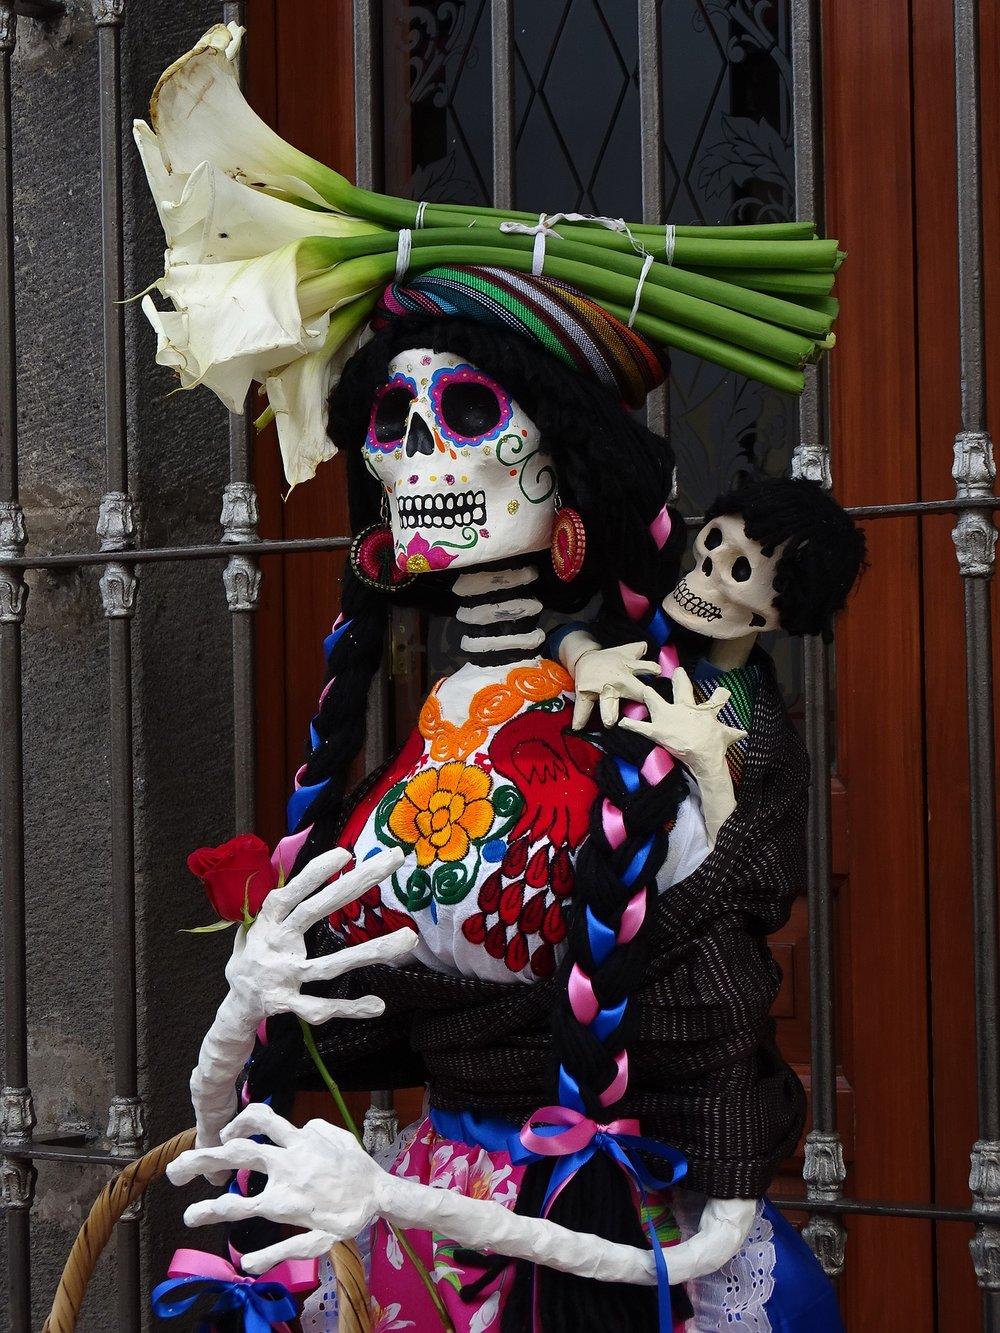 mexico-1568215_1920.jpg